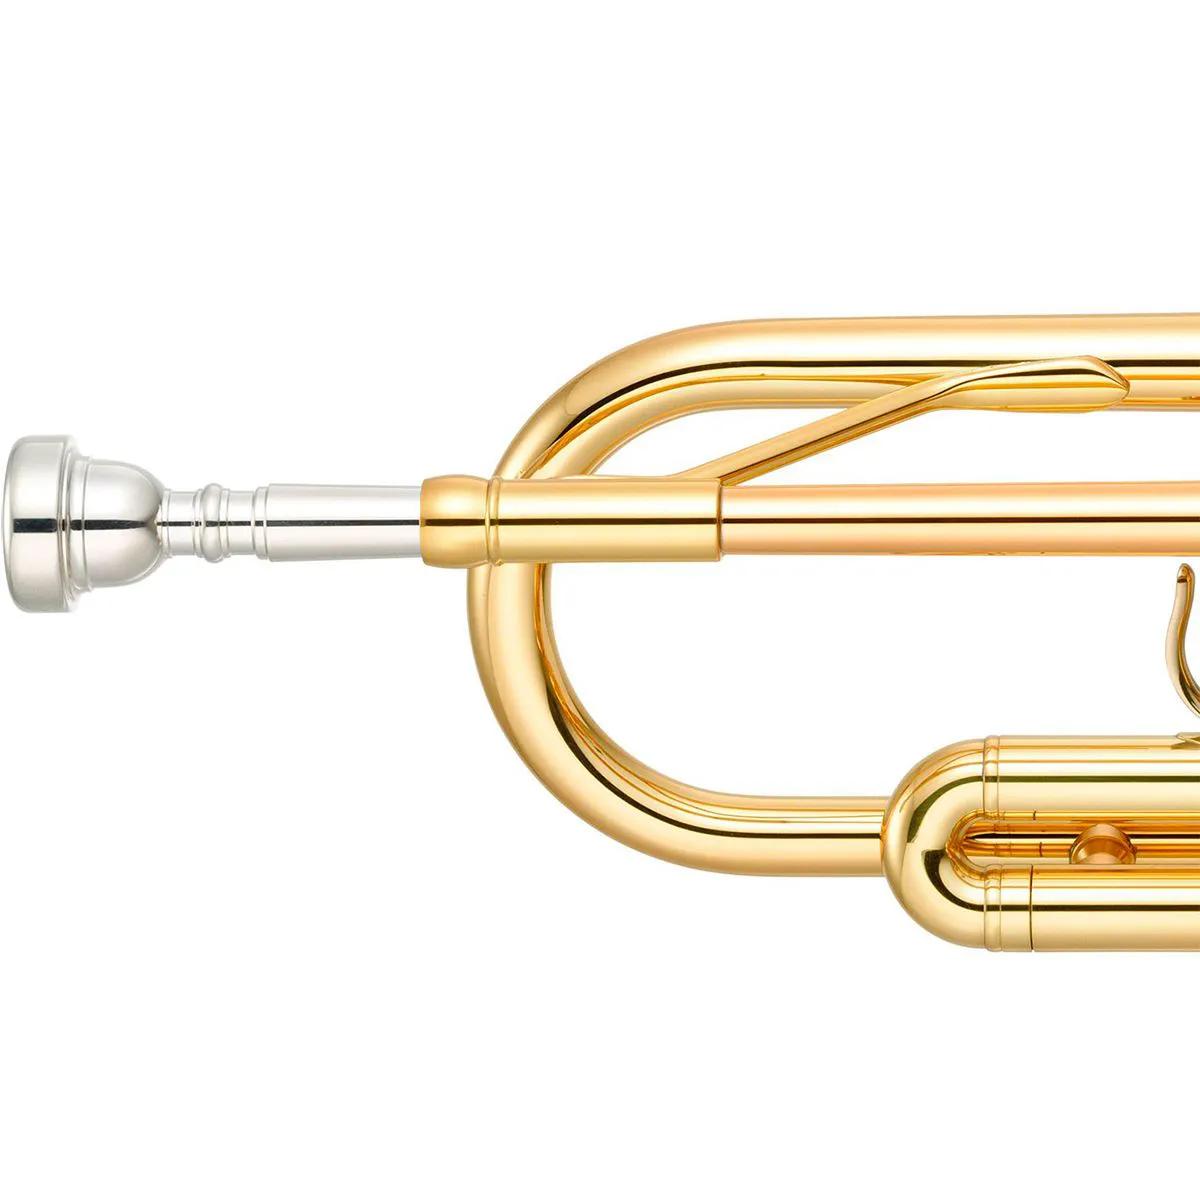 Trompete Yamaha YTR3335 Bb Laqueado Dourado com Case